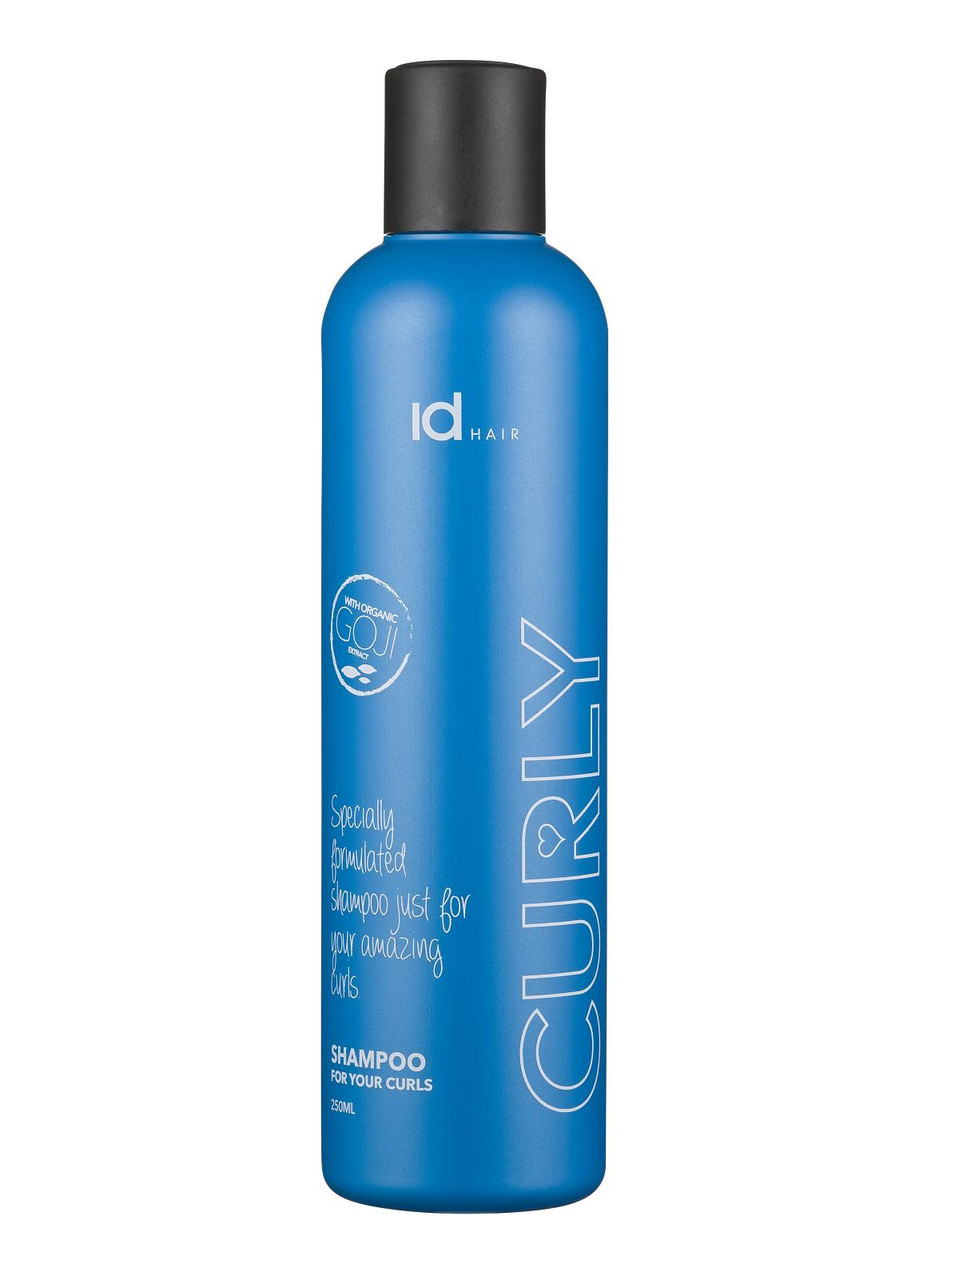 Id  HAIR Curly  Шампунь д/вьющихся волос 250 ml